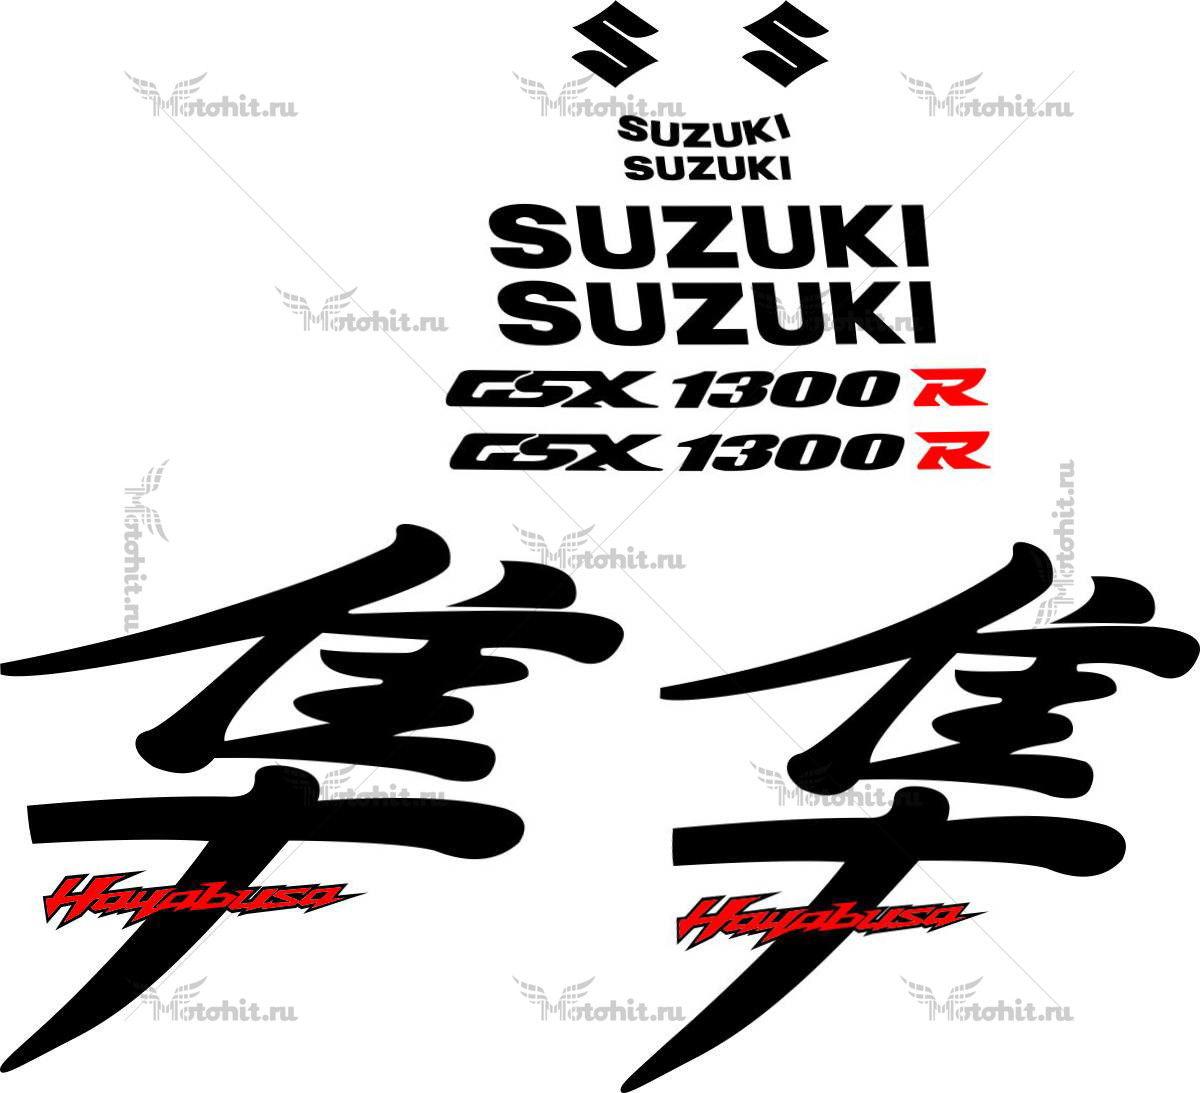 Комплект наклеек SUZUKI GSX-R-1300 HAYABUSA 2005-2006 BLACK-TXT